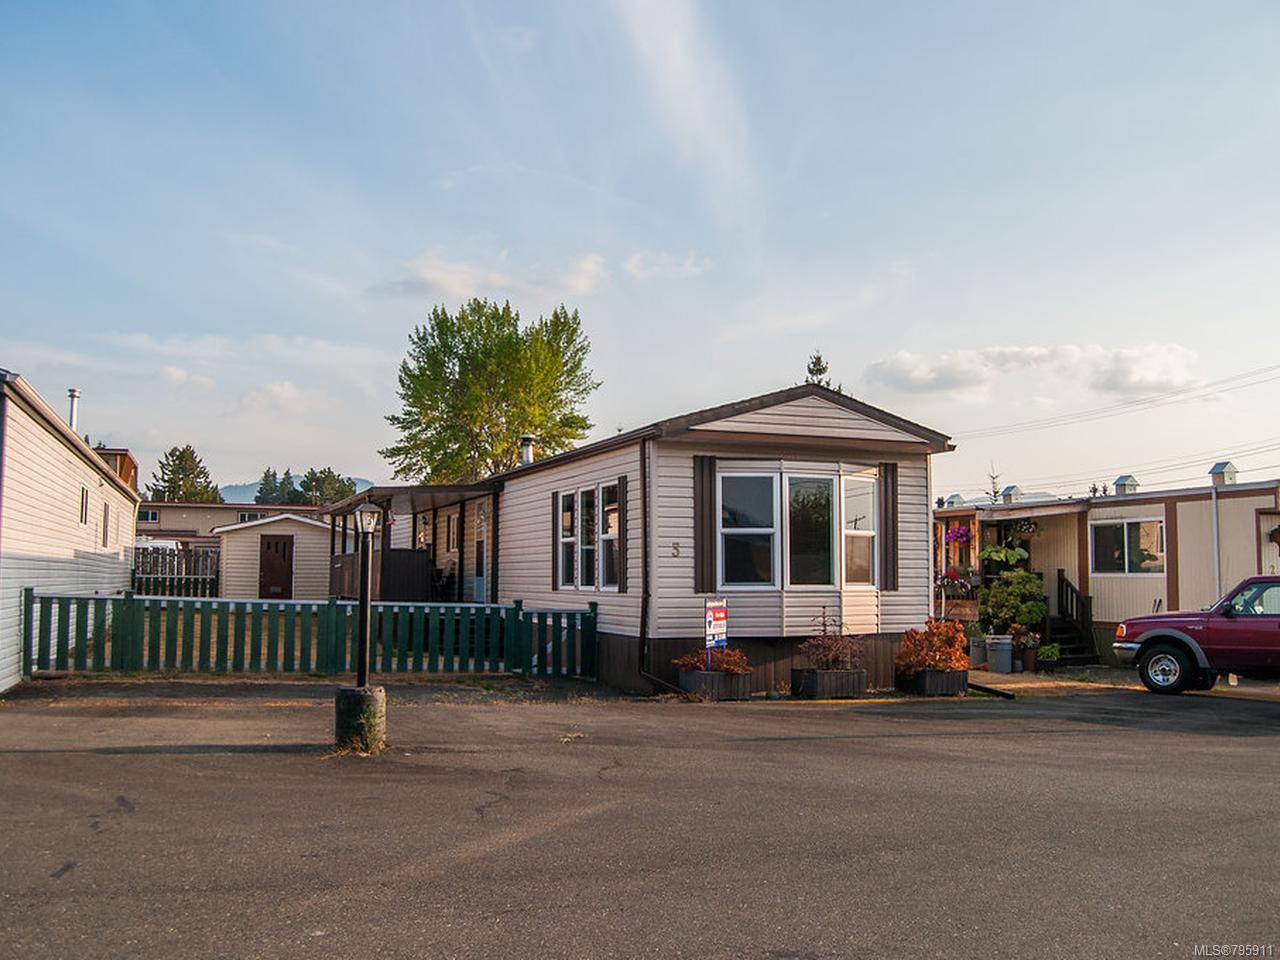 Main Photo: 3 3859 Wood Ave in PORT ALBERNI: PA Port Alberni Manufactured Home for sale (Port Alberni)  : MLS®# 795911